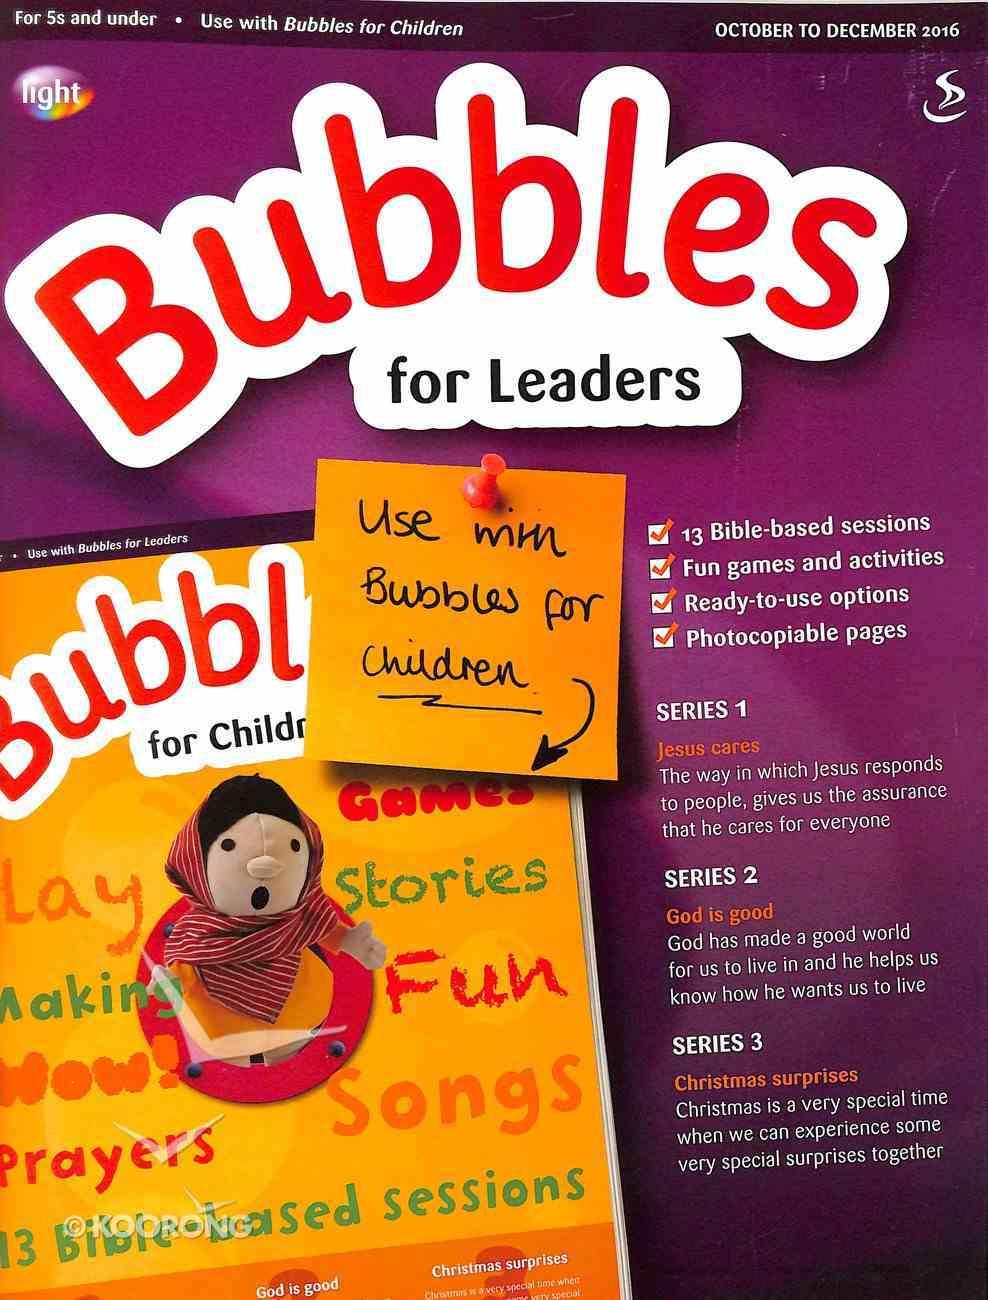 Light: Bubbles 2016 #04: Oct-Dec Teacher's Guide (5 And Under) Paperback